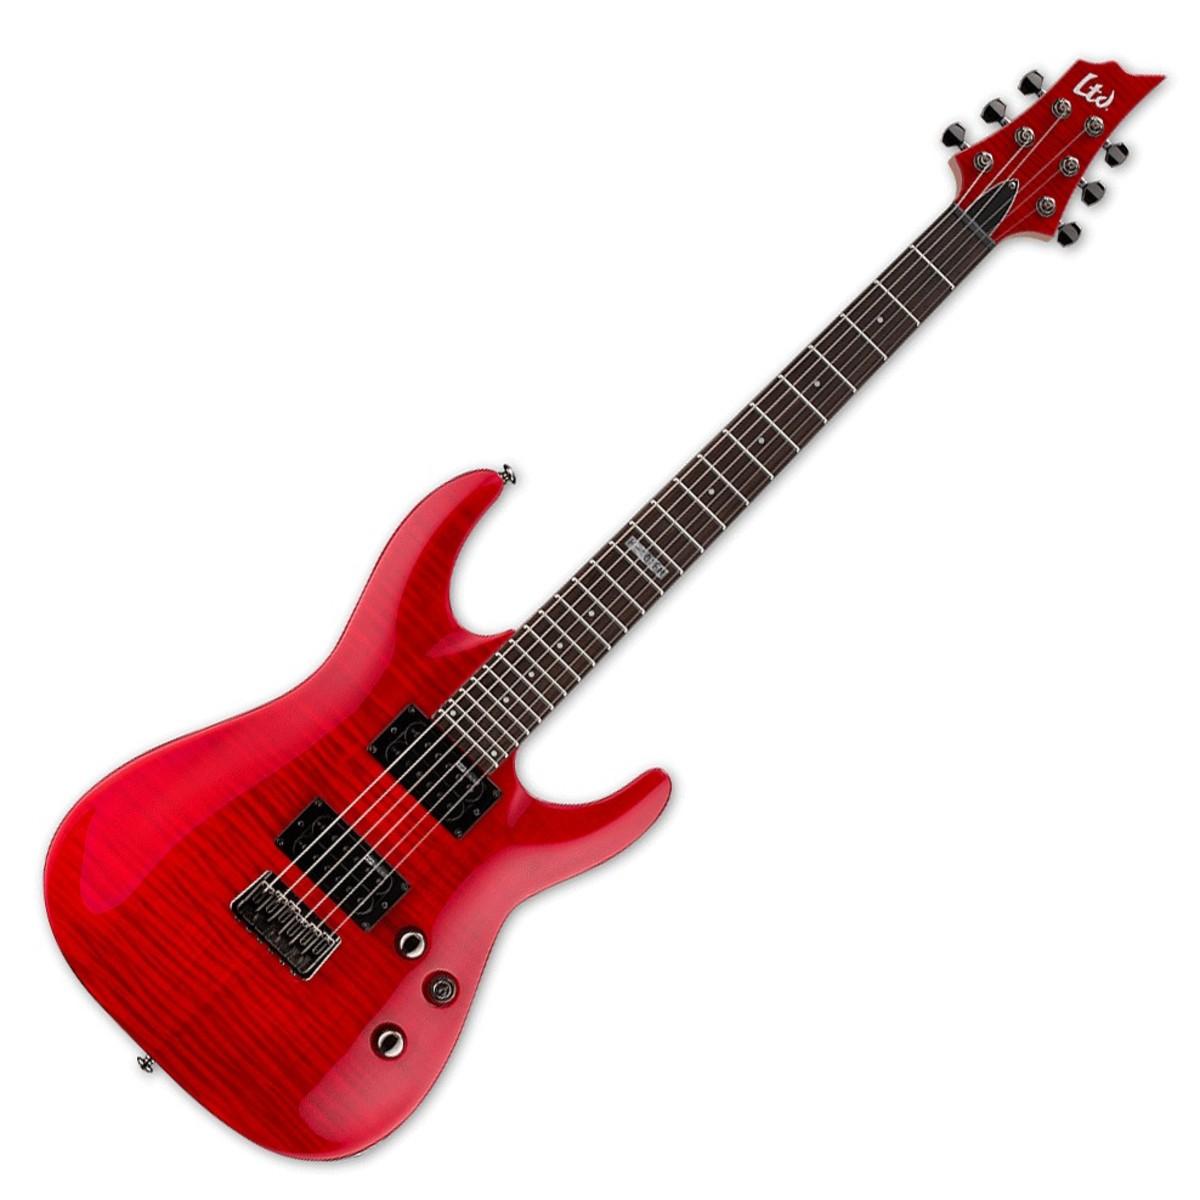 esp ltd h 101fm see thru red electric guitar cornerstone music. Black Bedroom Furniture Sets. Home Design Ideas